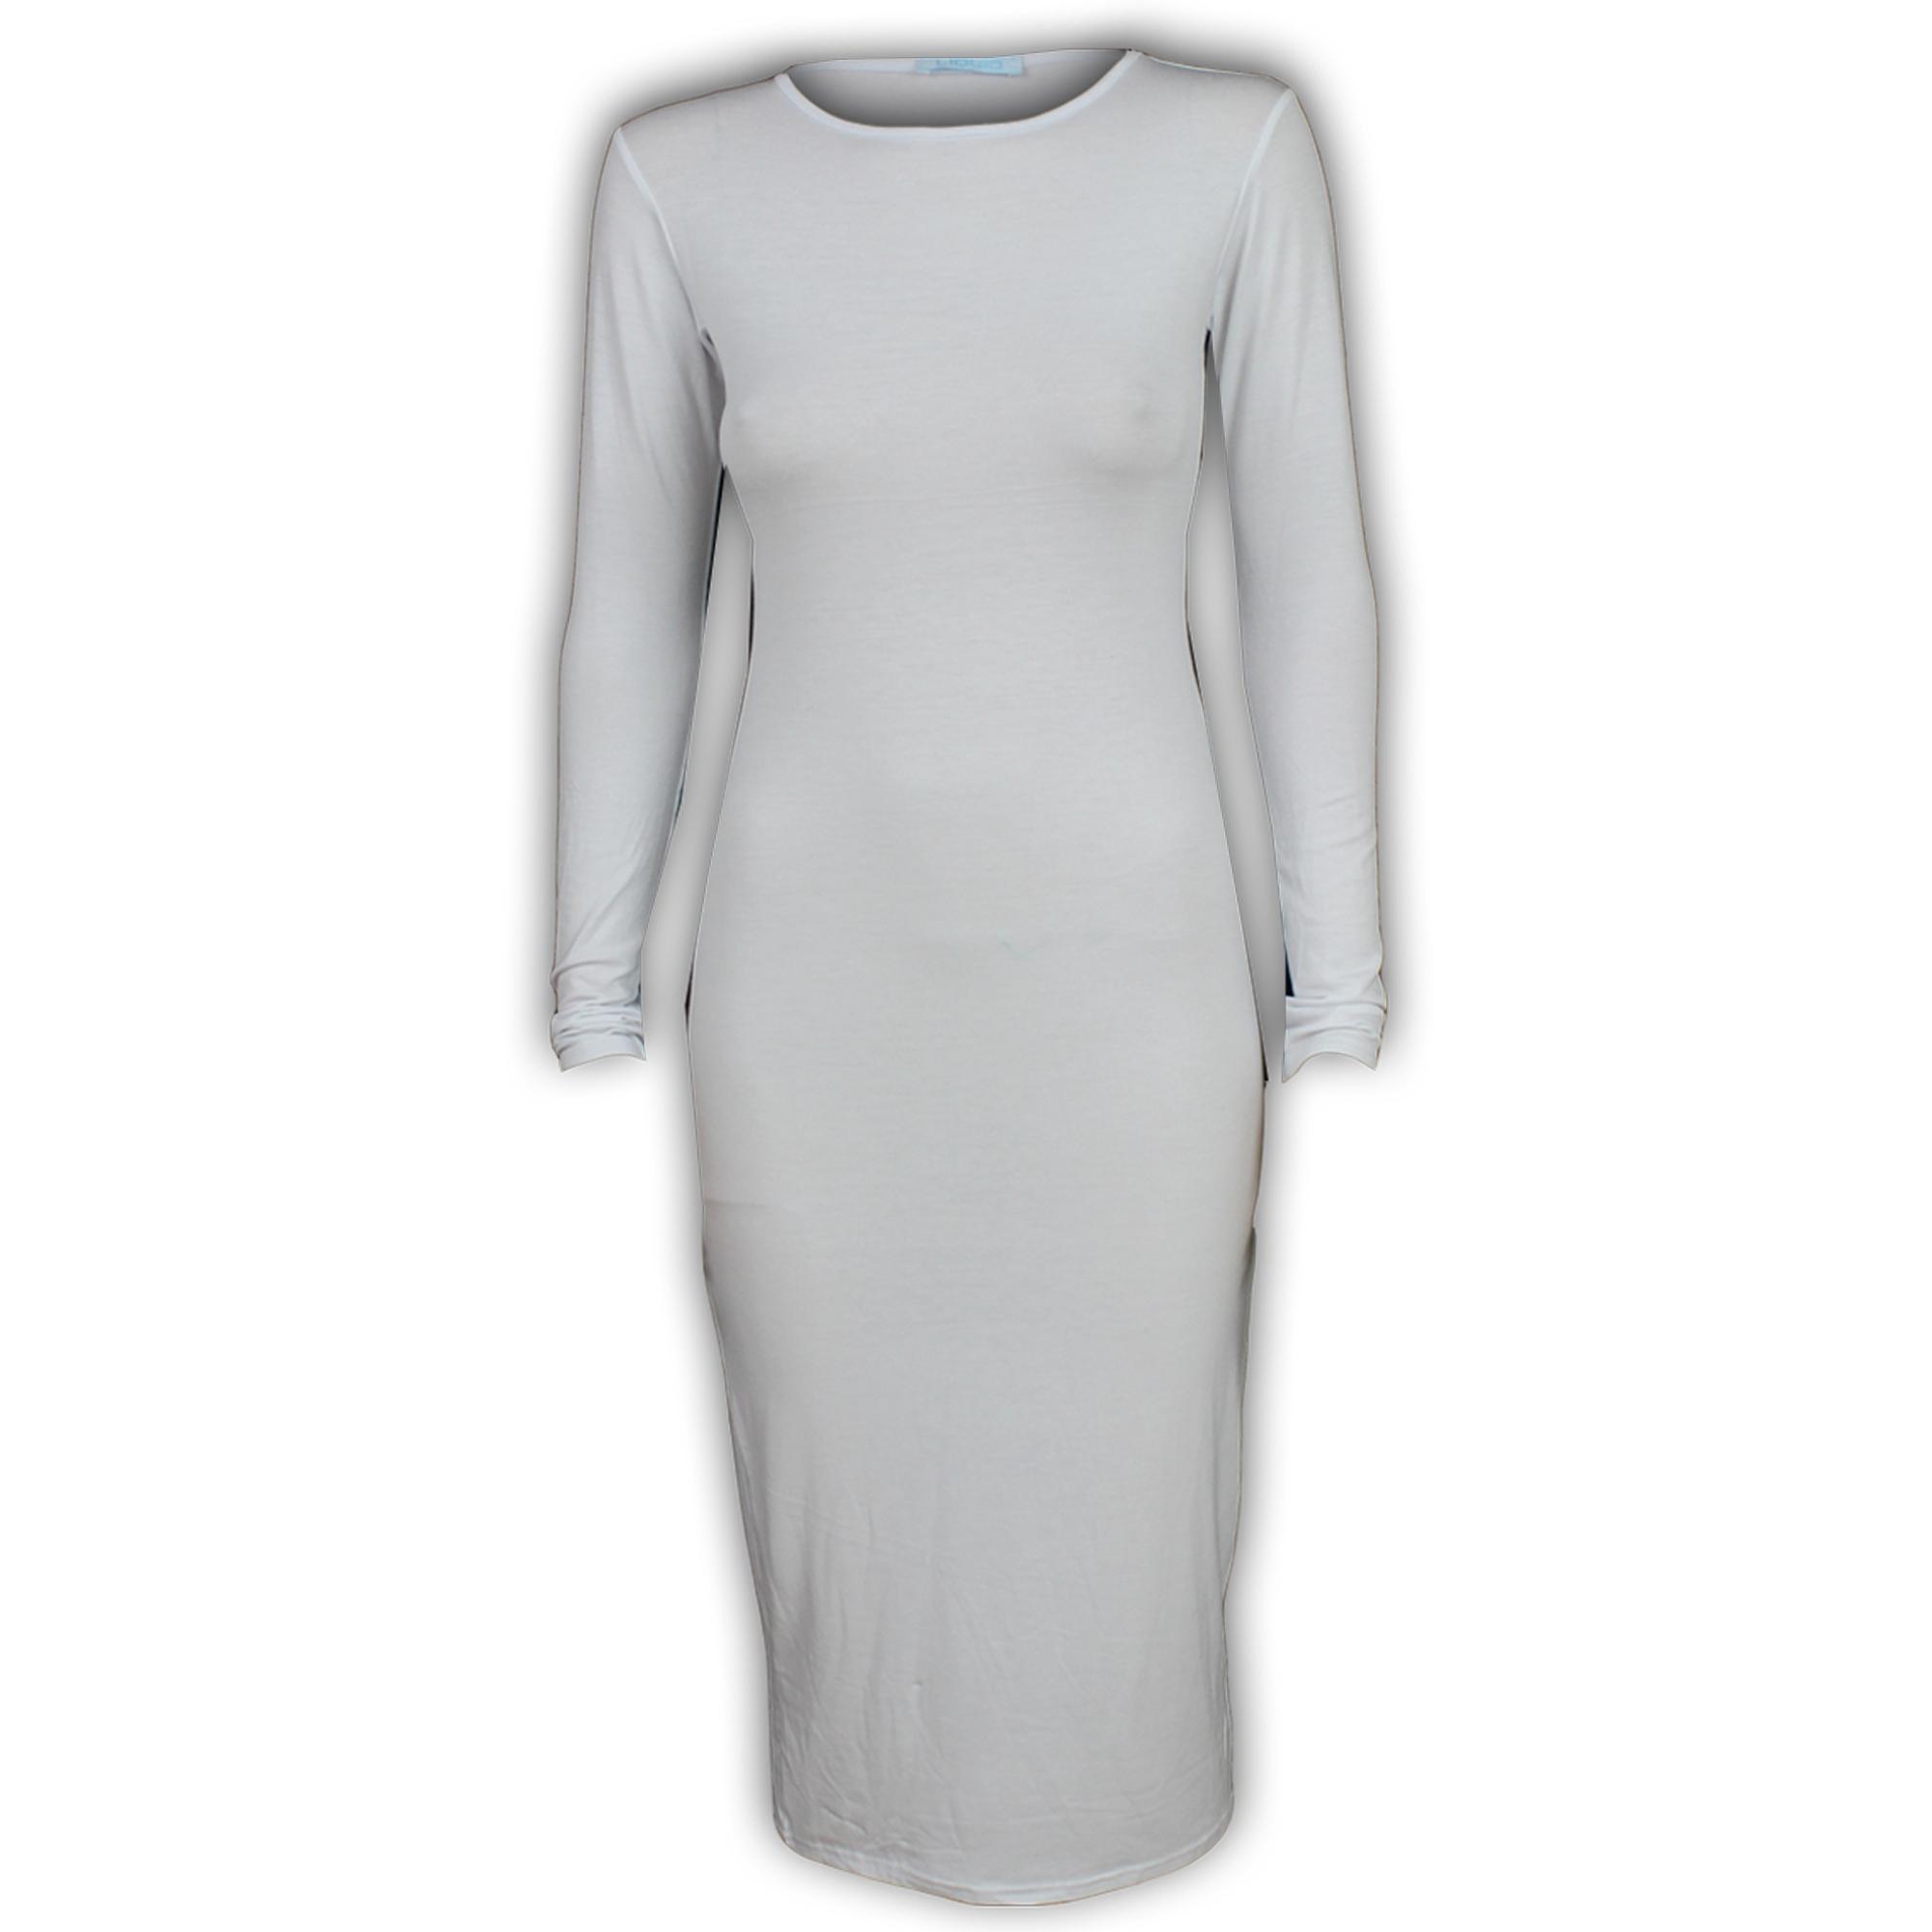 Neck Dresses Bodycon Crew Plain Long Sleeve tennessee dillards